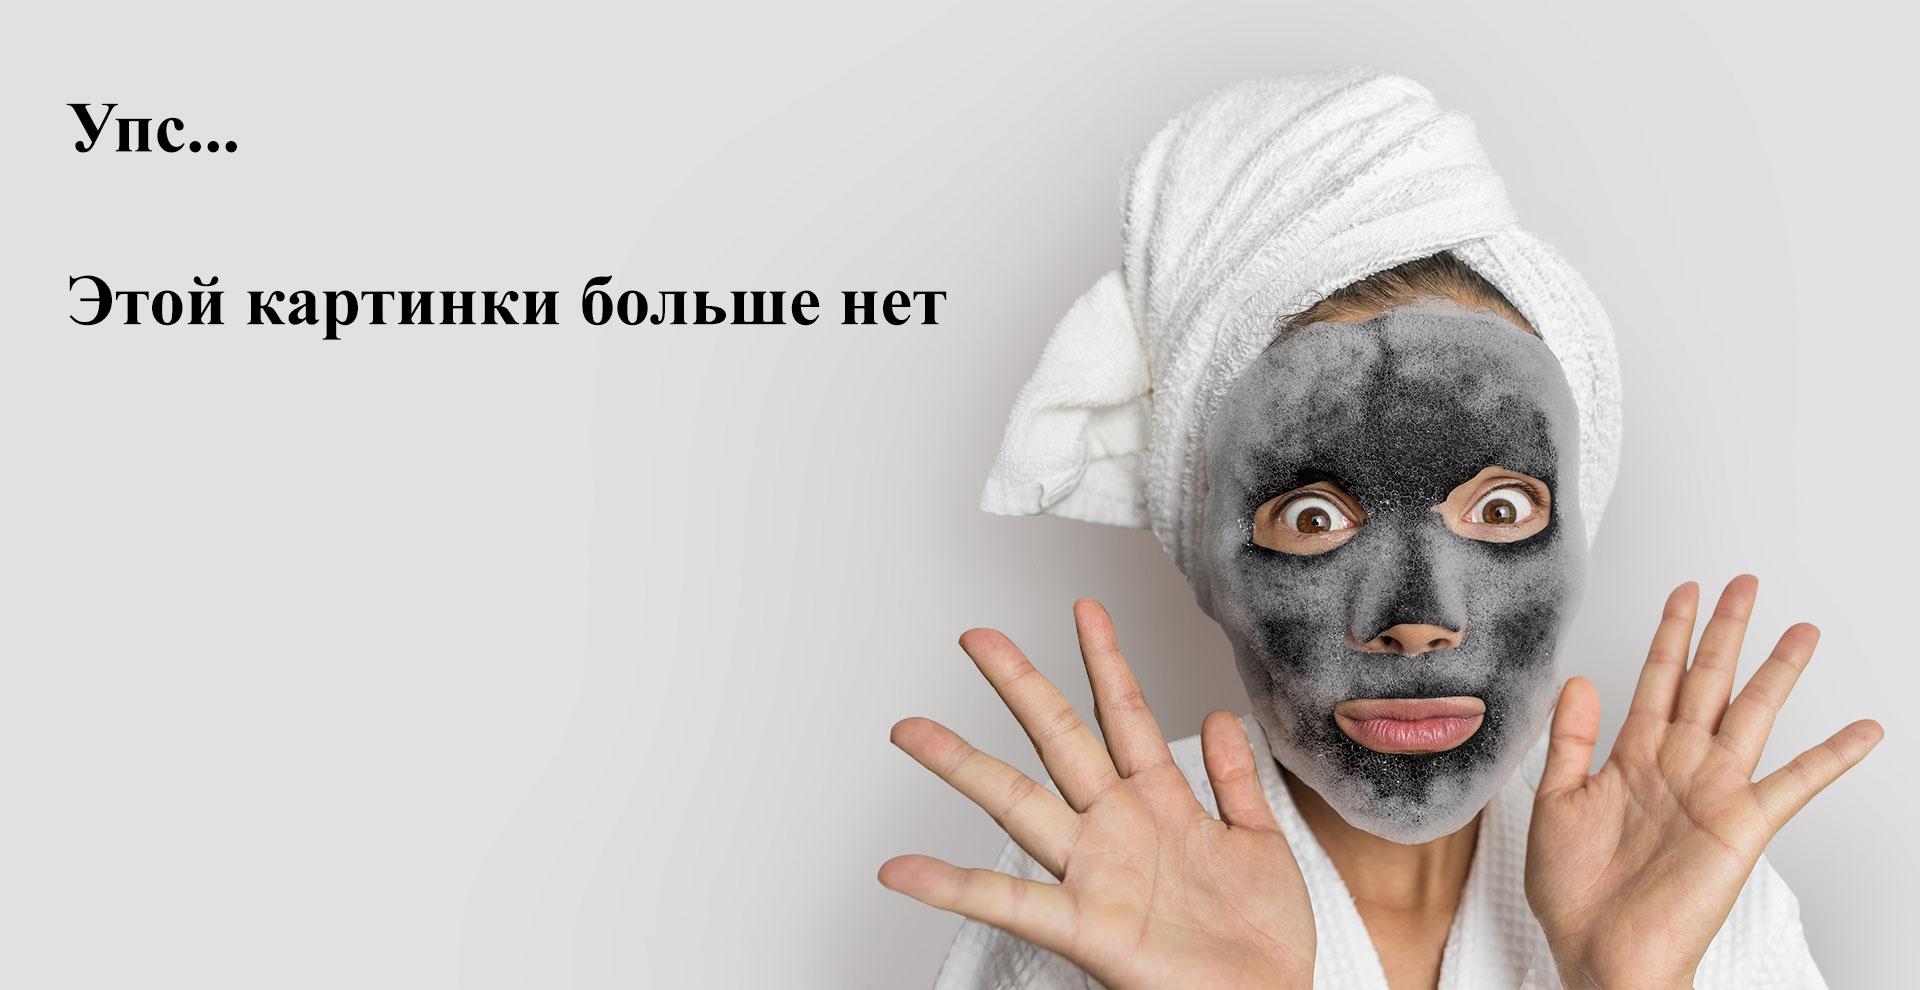 Patrisa Nail, Гель-лак «Стиль жизни» №436